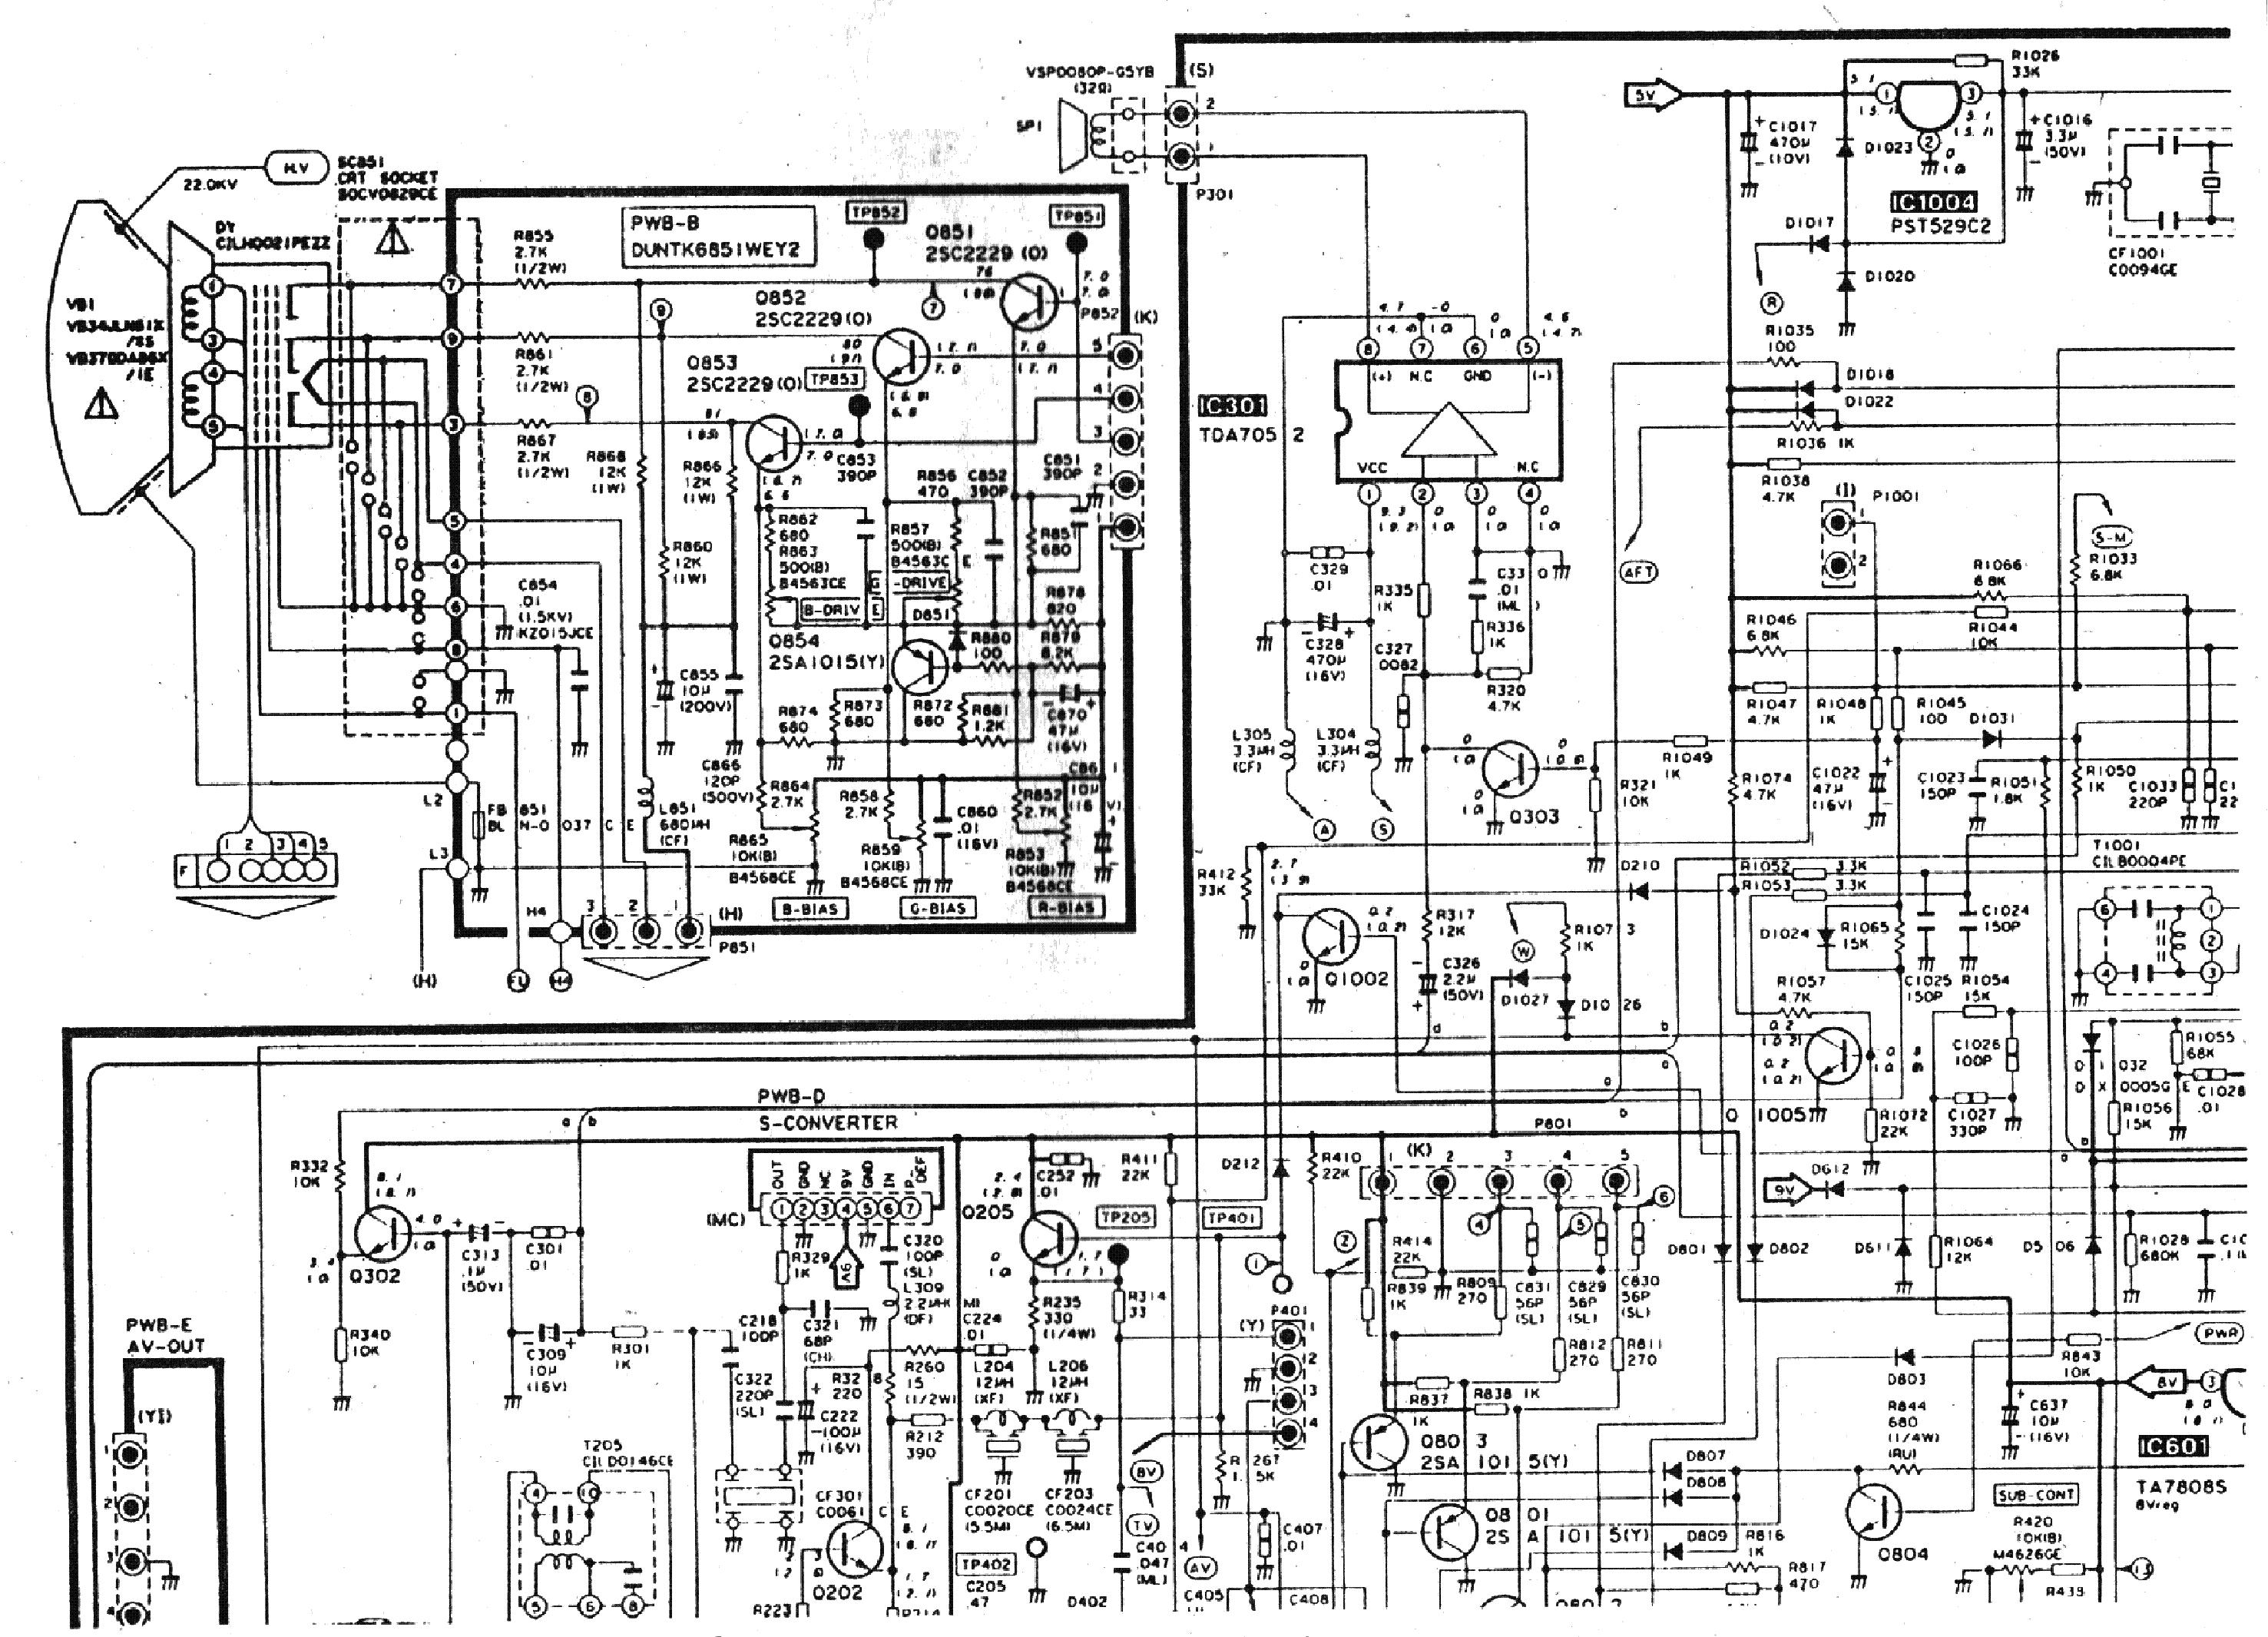 Sharp 14b sc схема